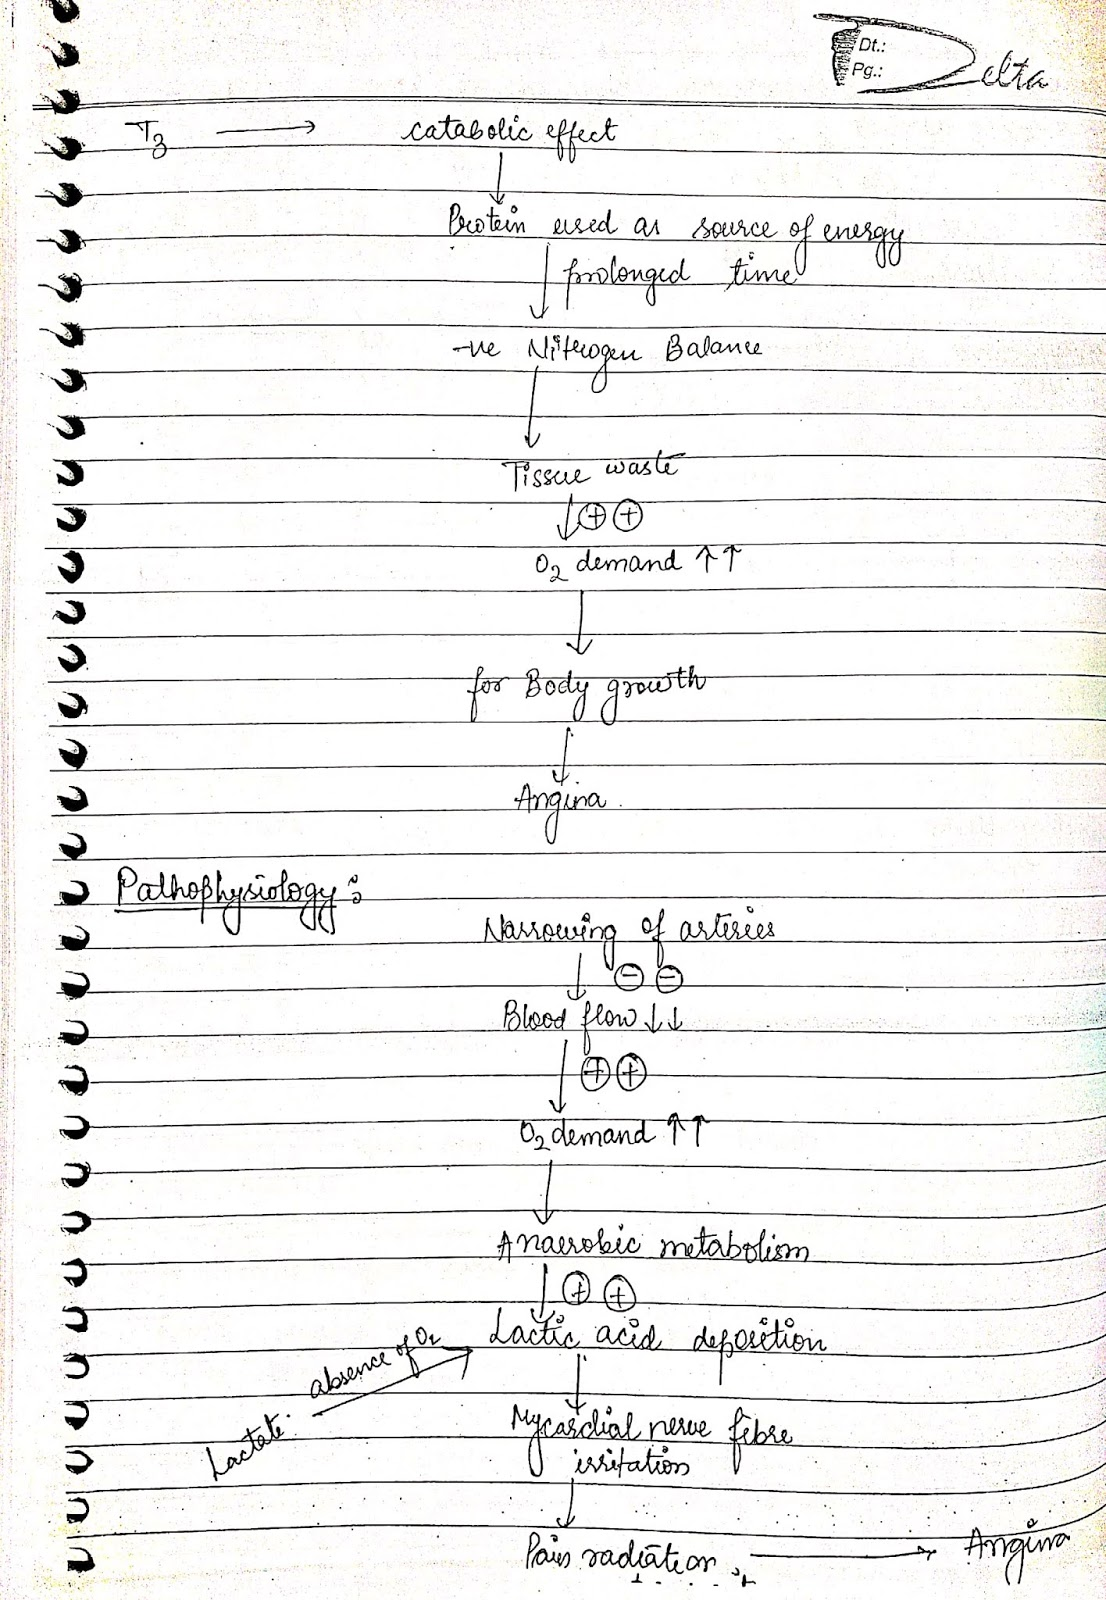 pathophysiology - angina pectoris thyroism